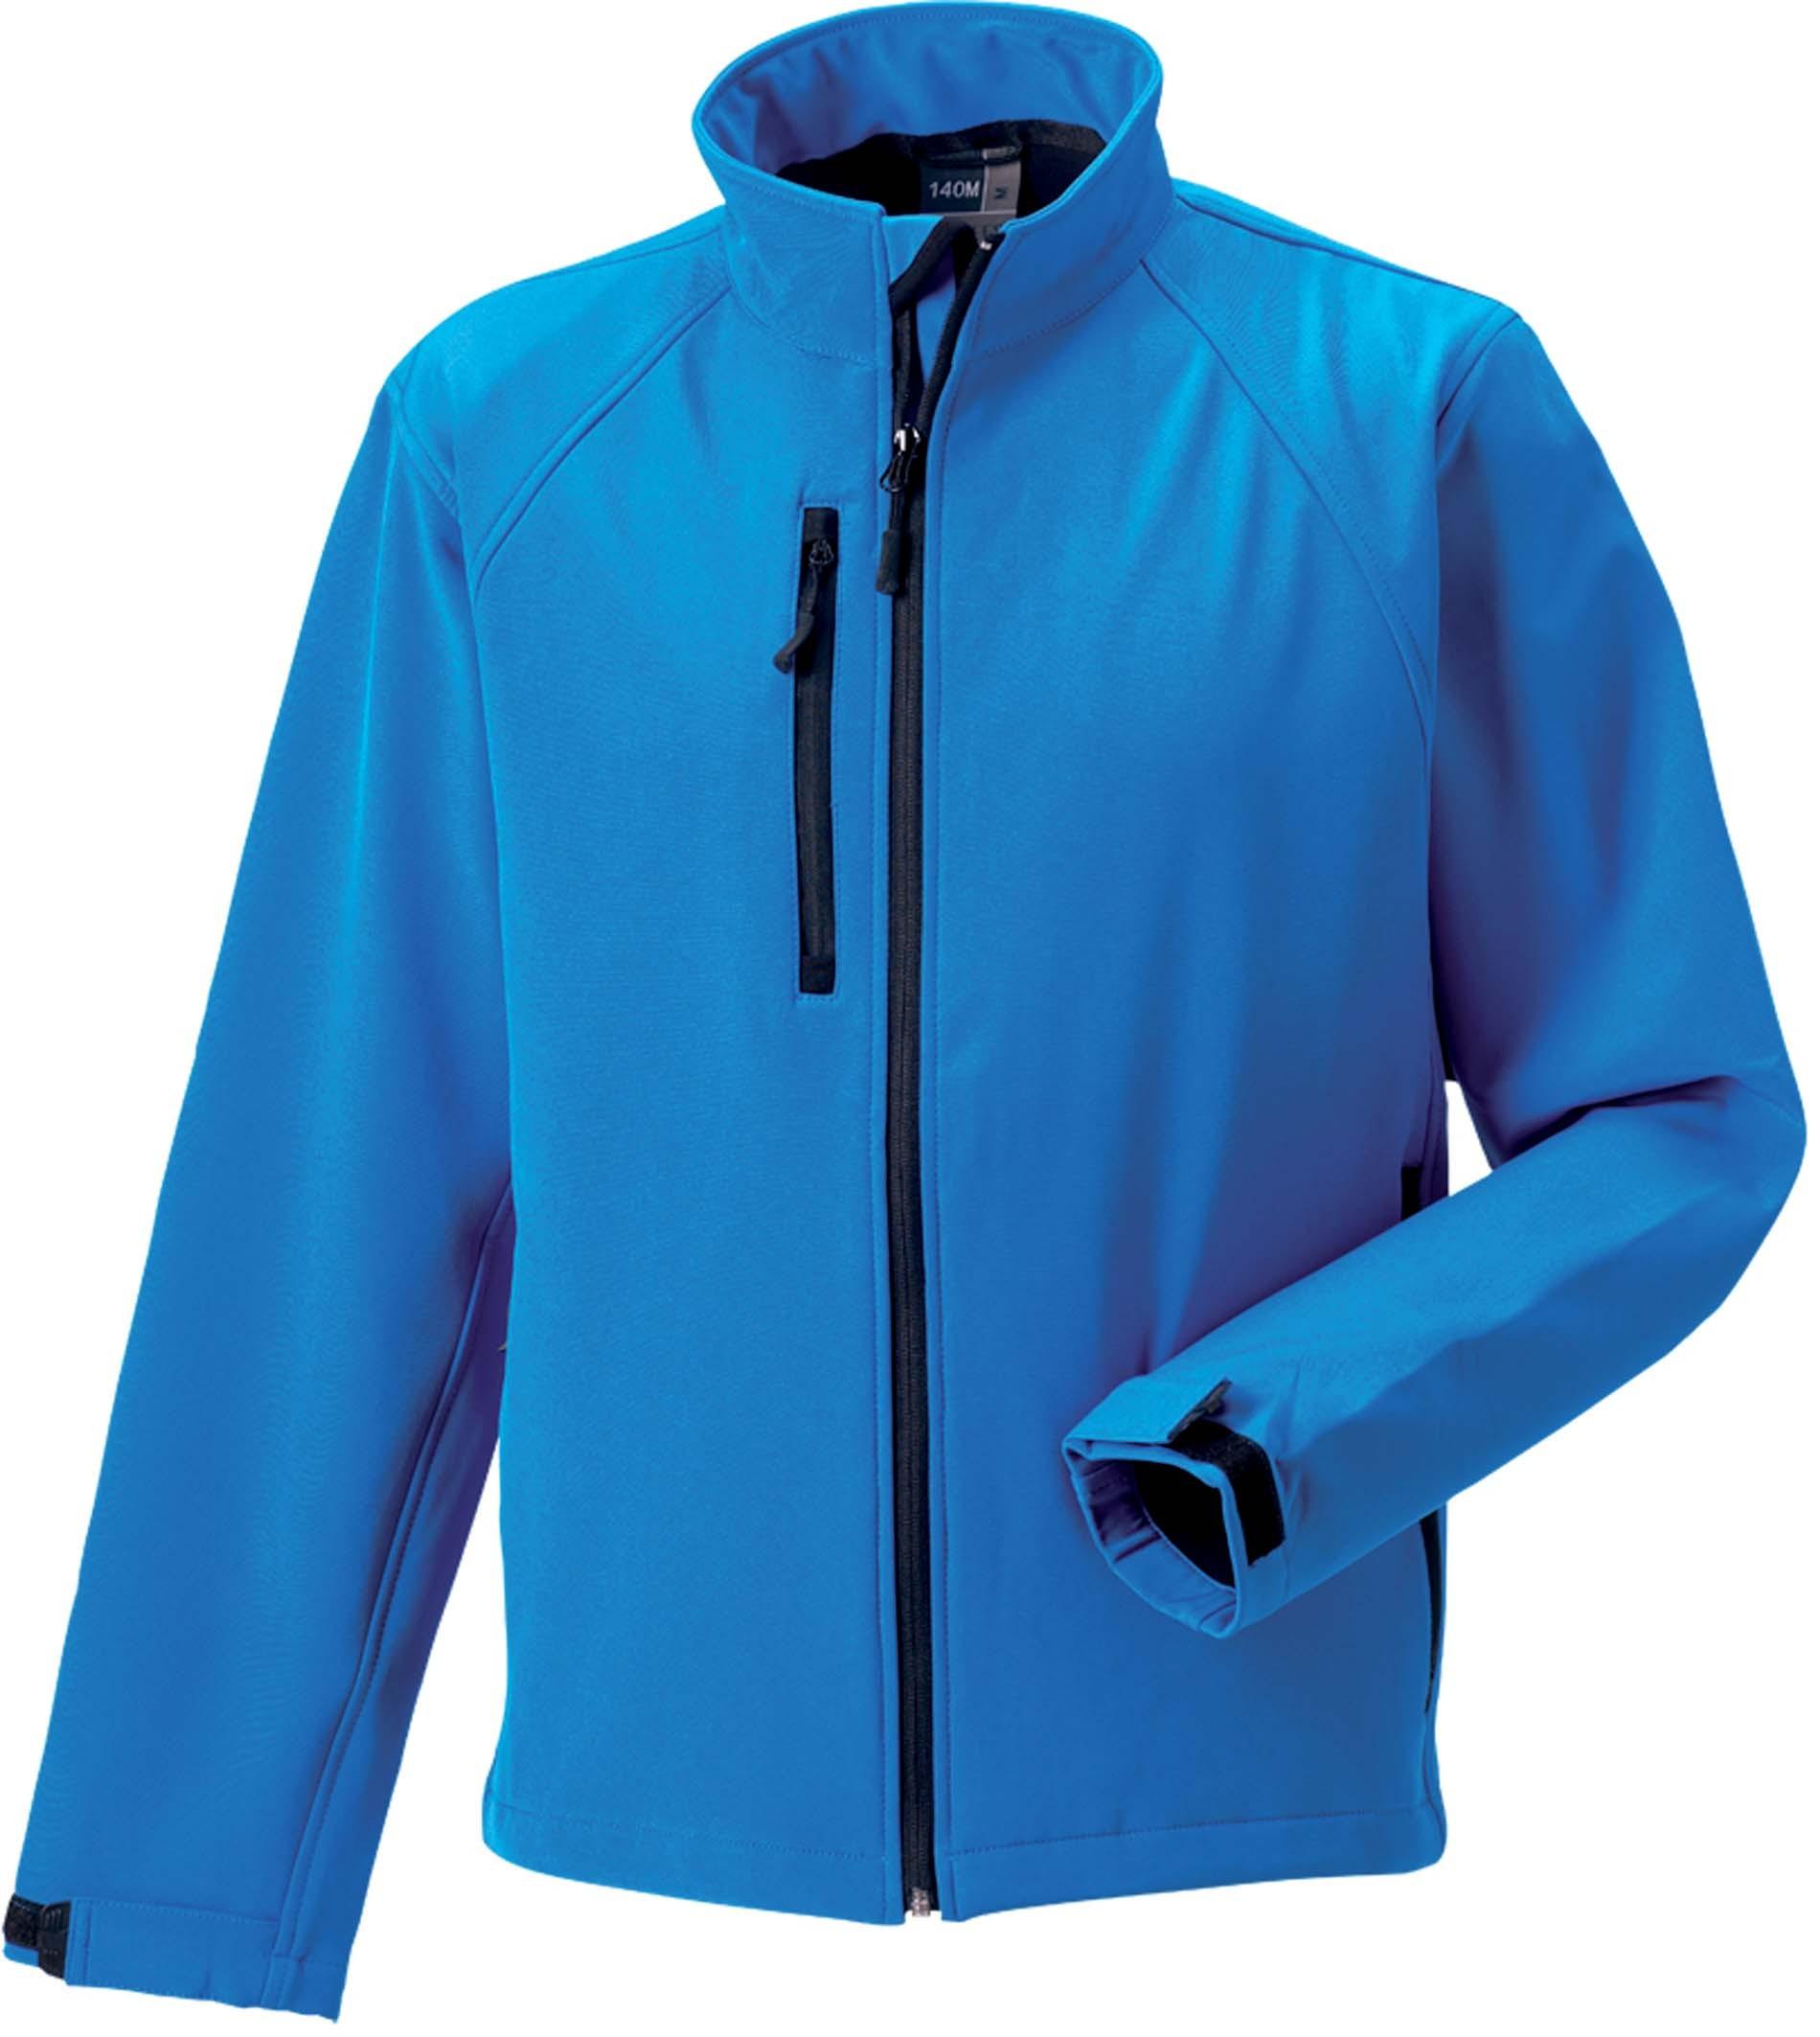 Softshell Destockage Ditexpro Veste Homme Azure Bleu sQrxChdt